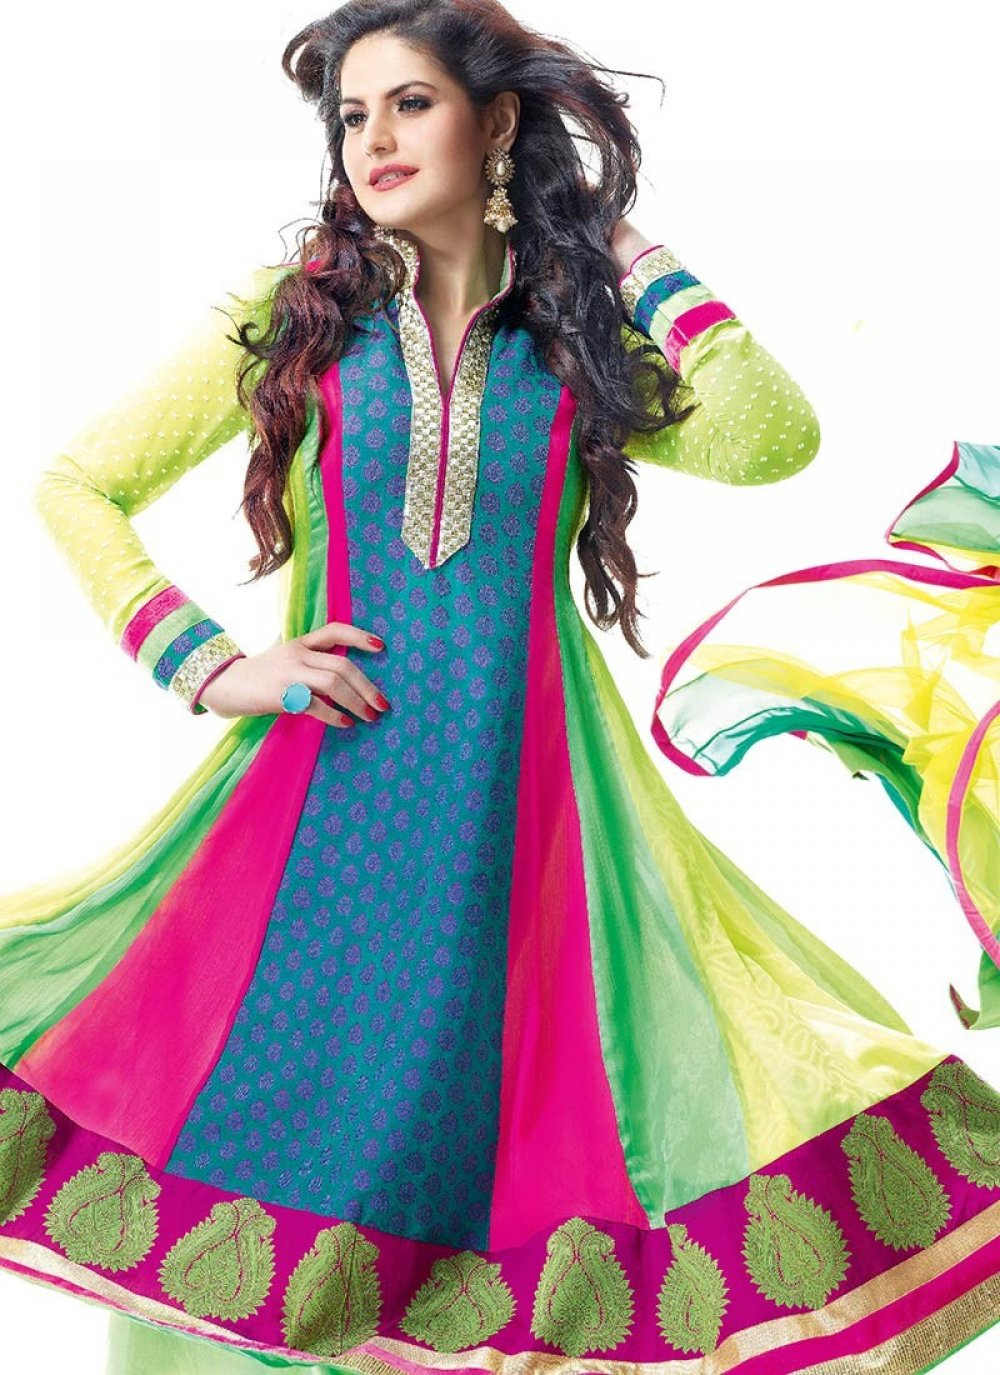 Multicolored Chiffon Salwar Kameez